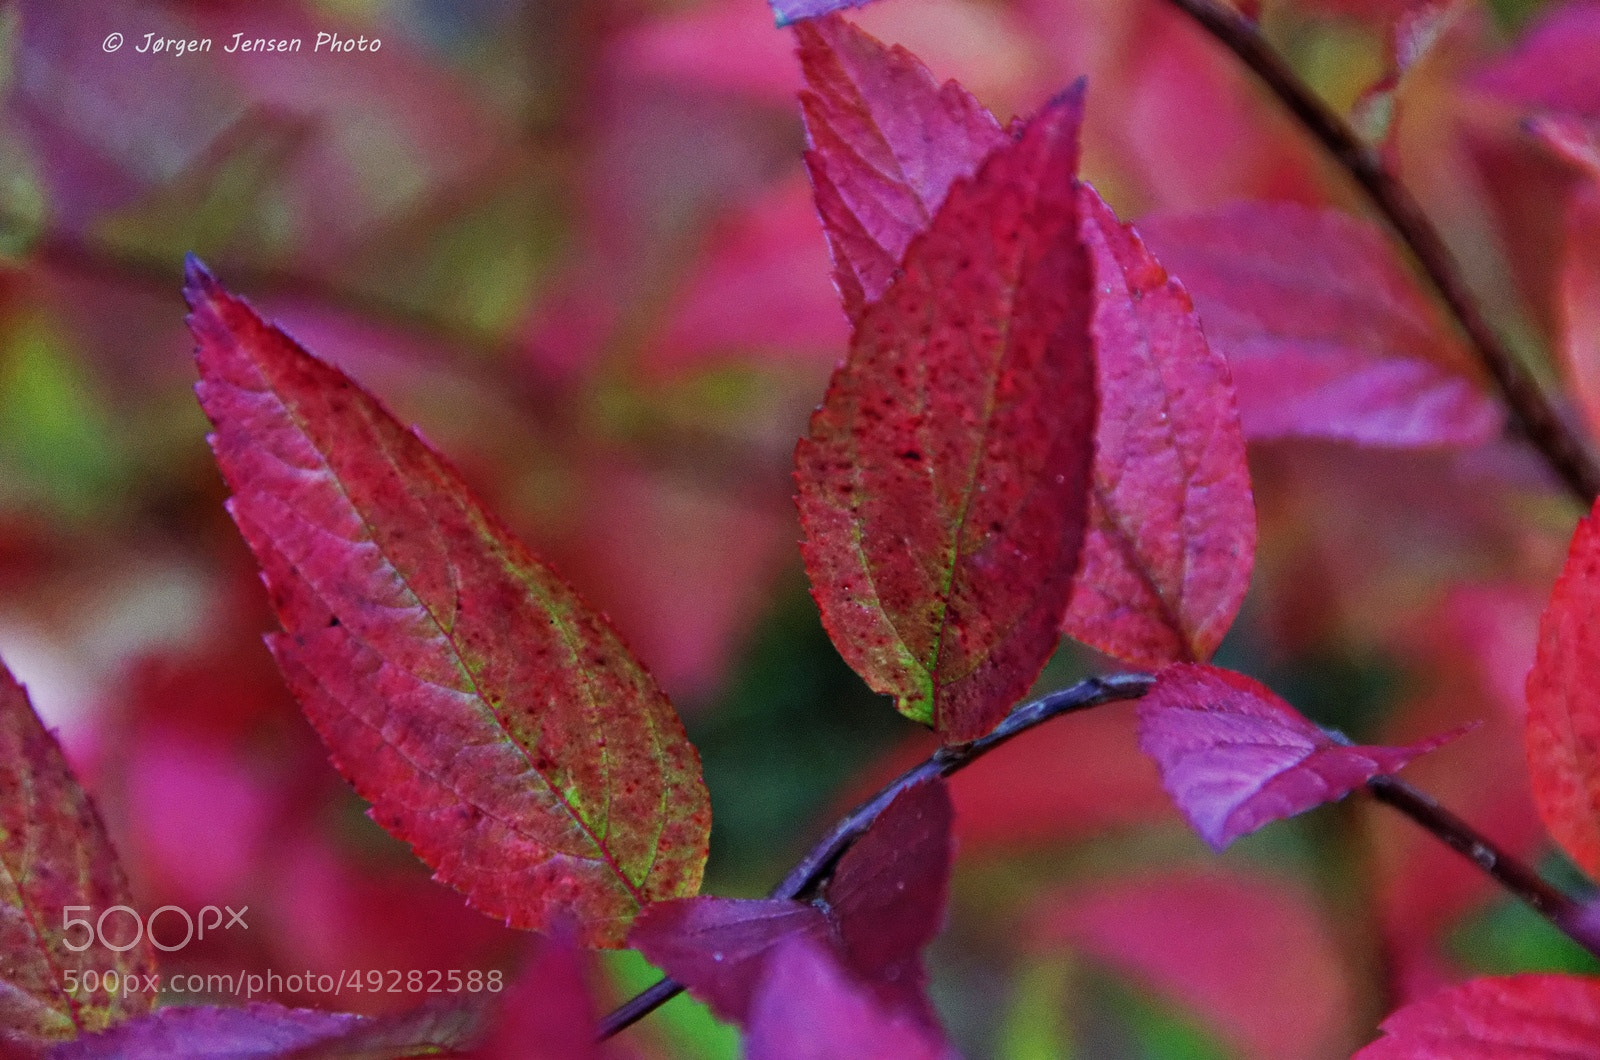 Photograph Red autumn by Jørgen Jensen on 500px